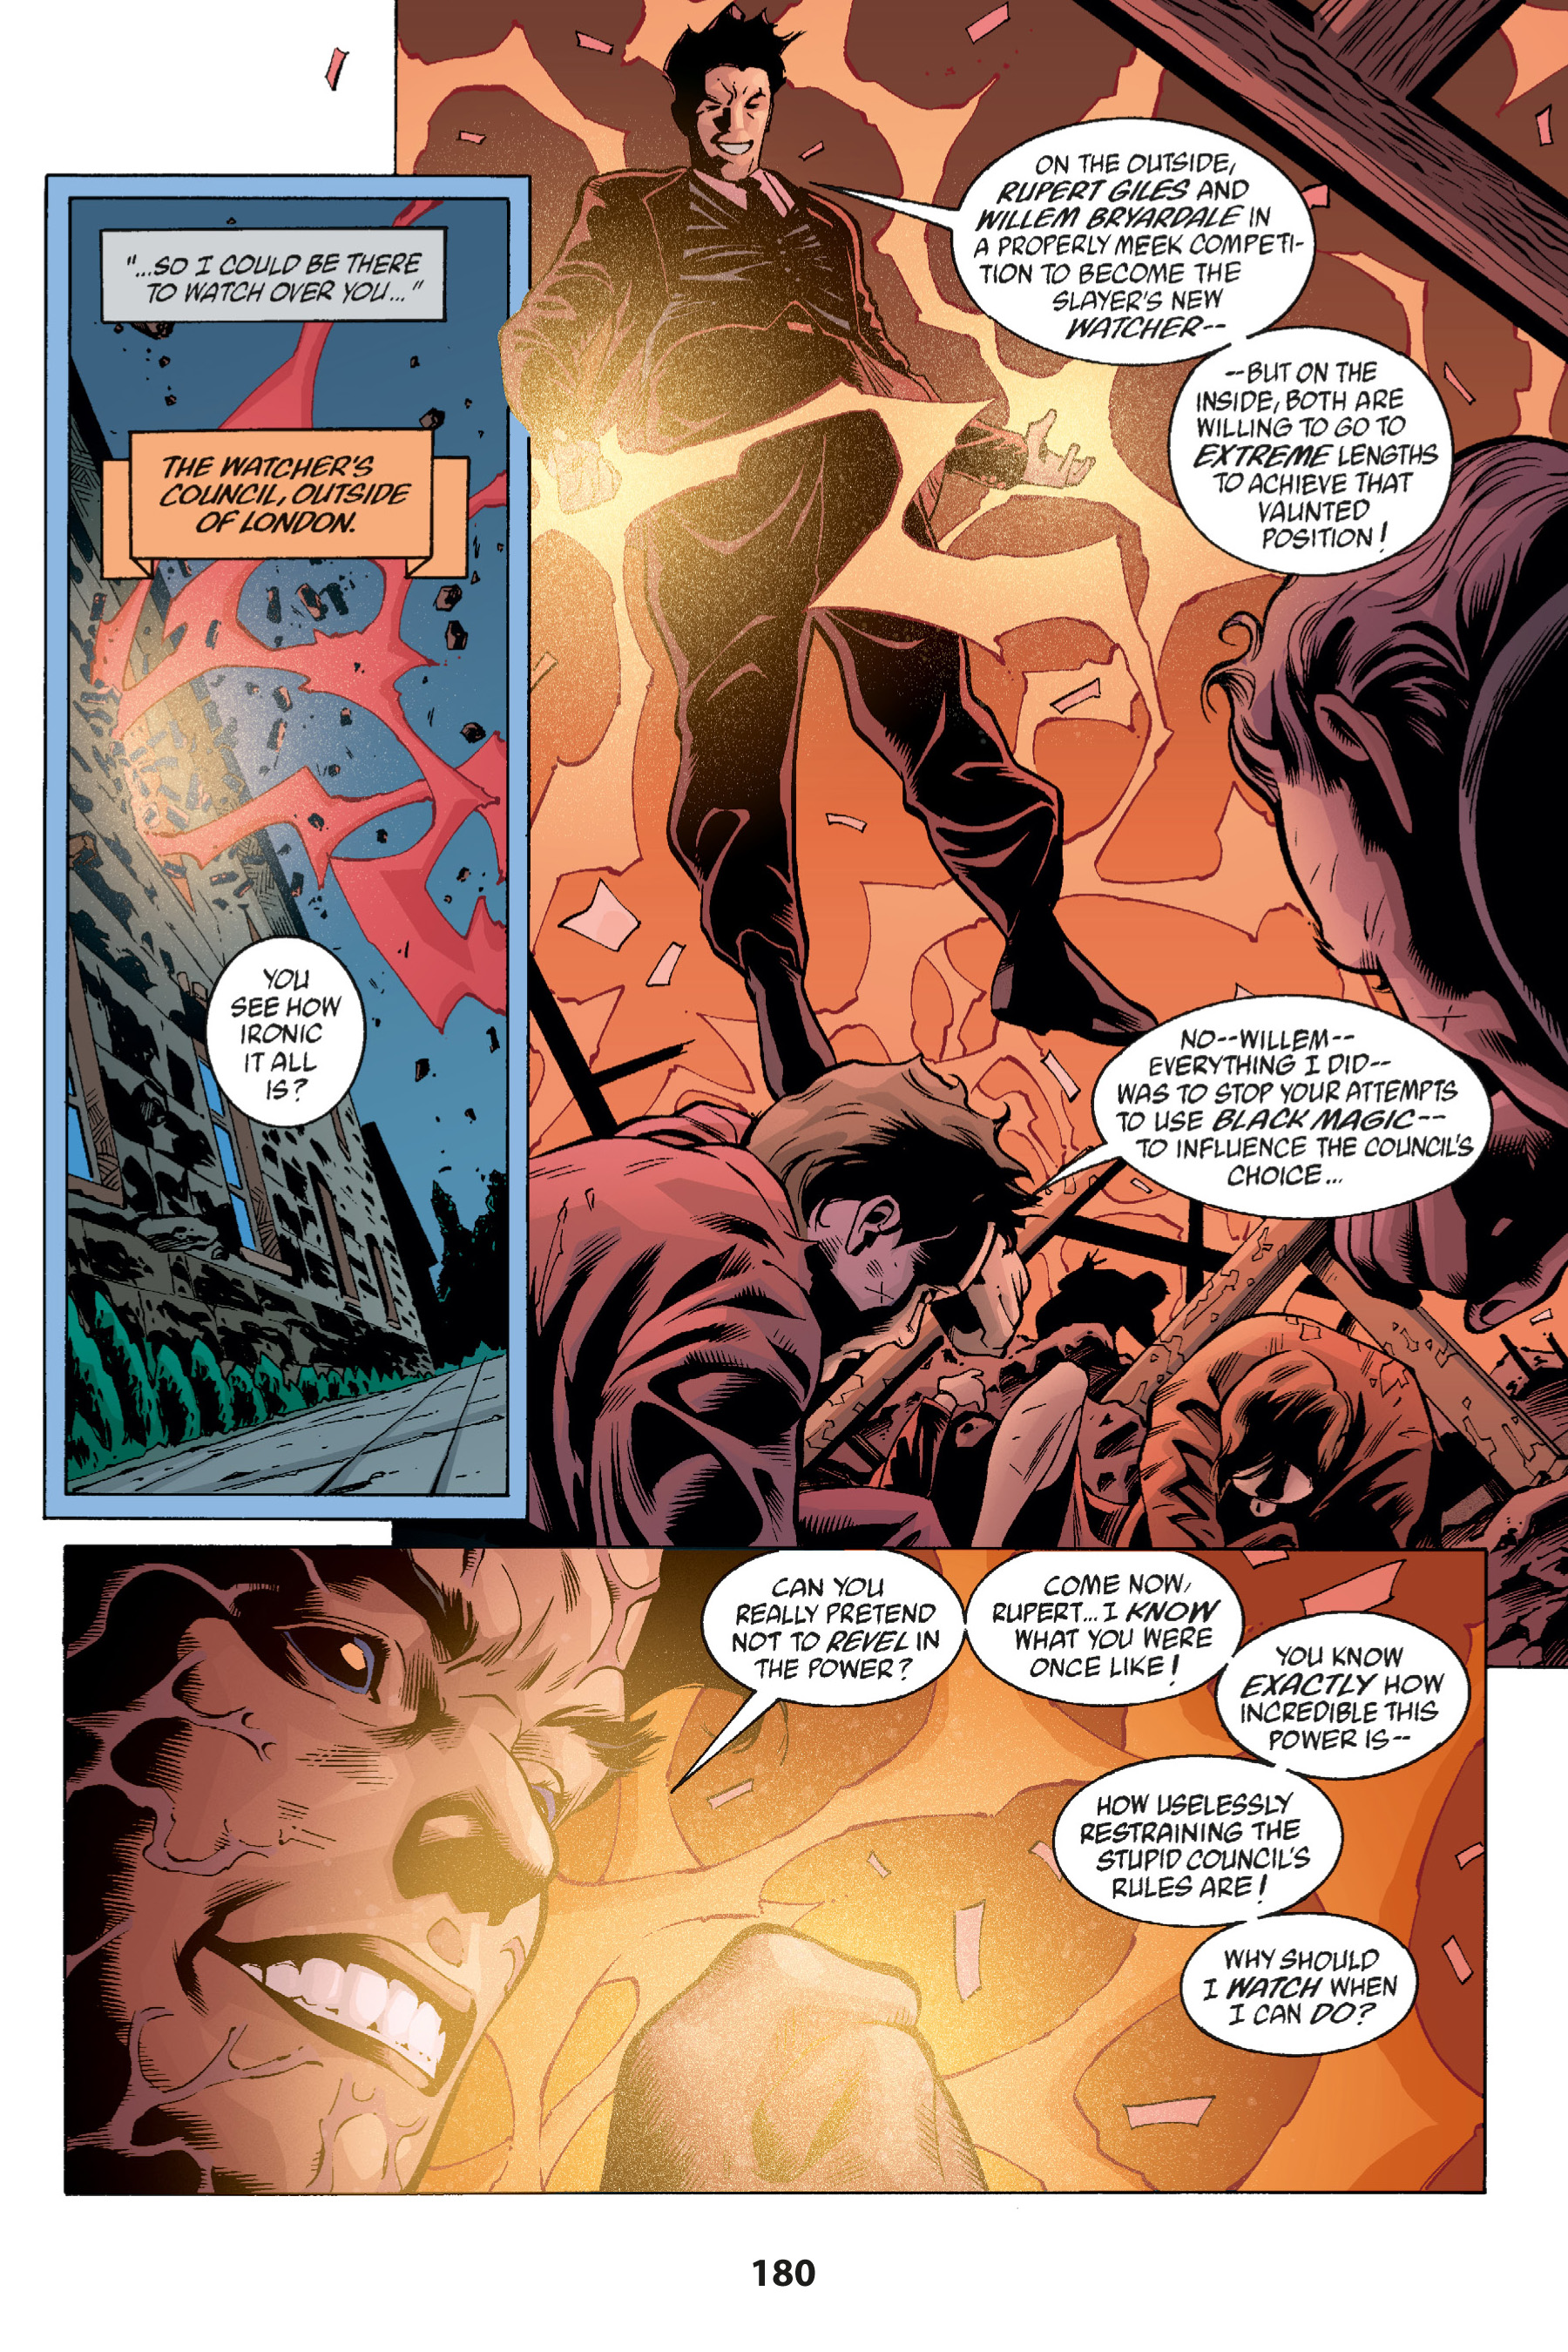 Read online Buffy the Vampire Slayer: Omnibus comic -  Issue # TPB 1 - 178